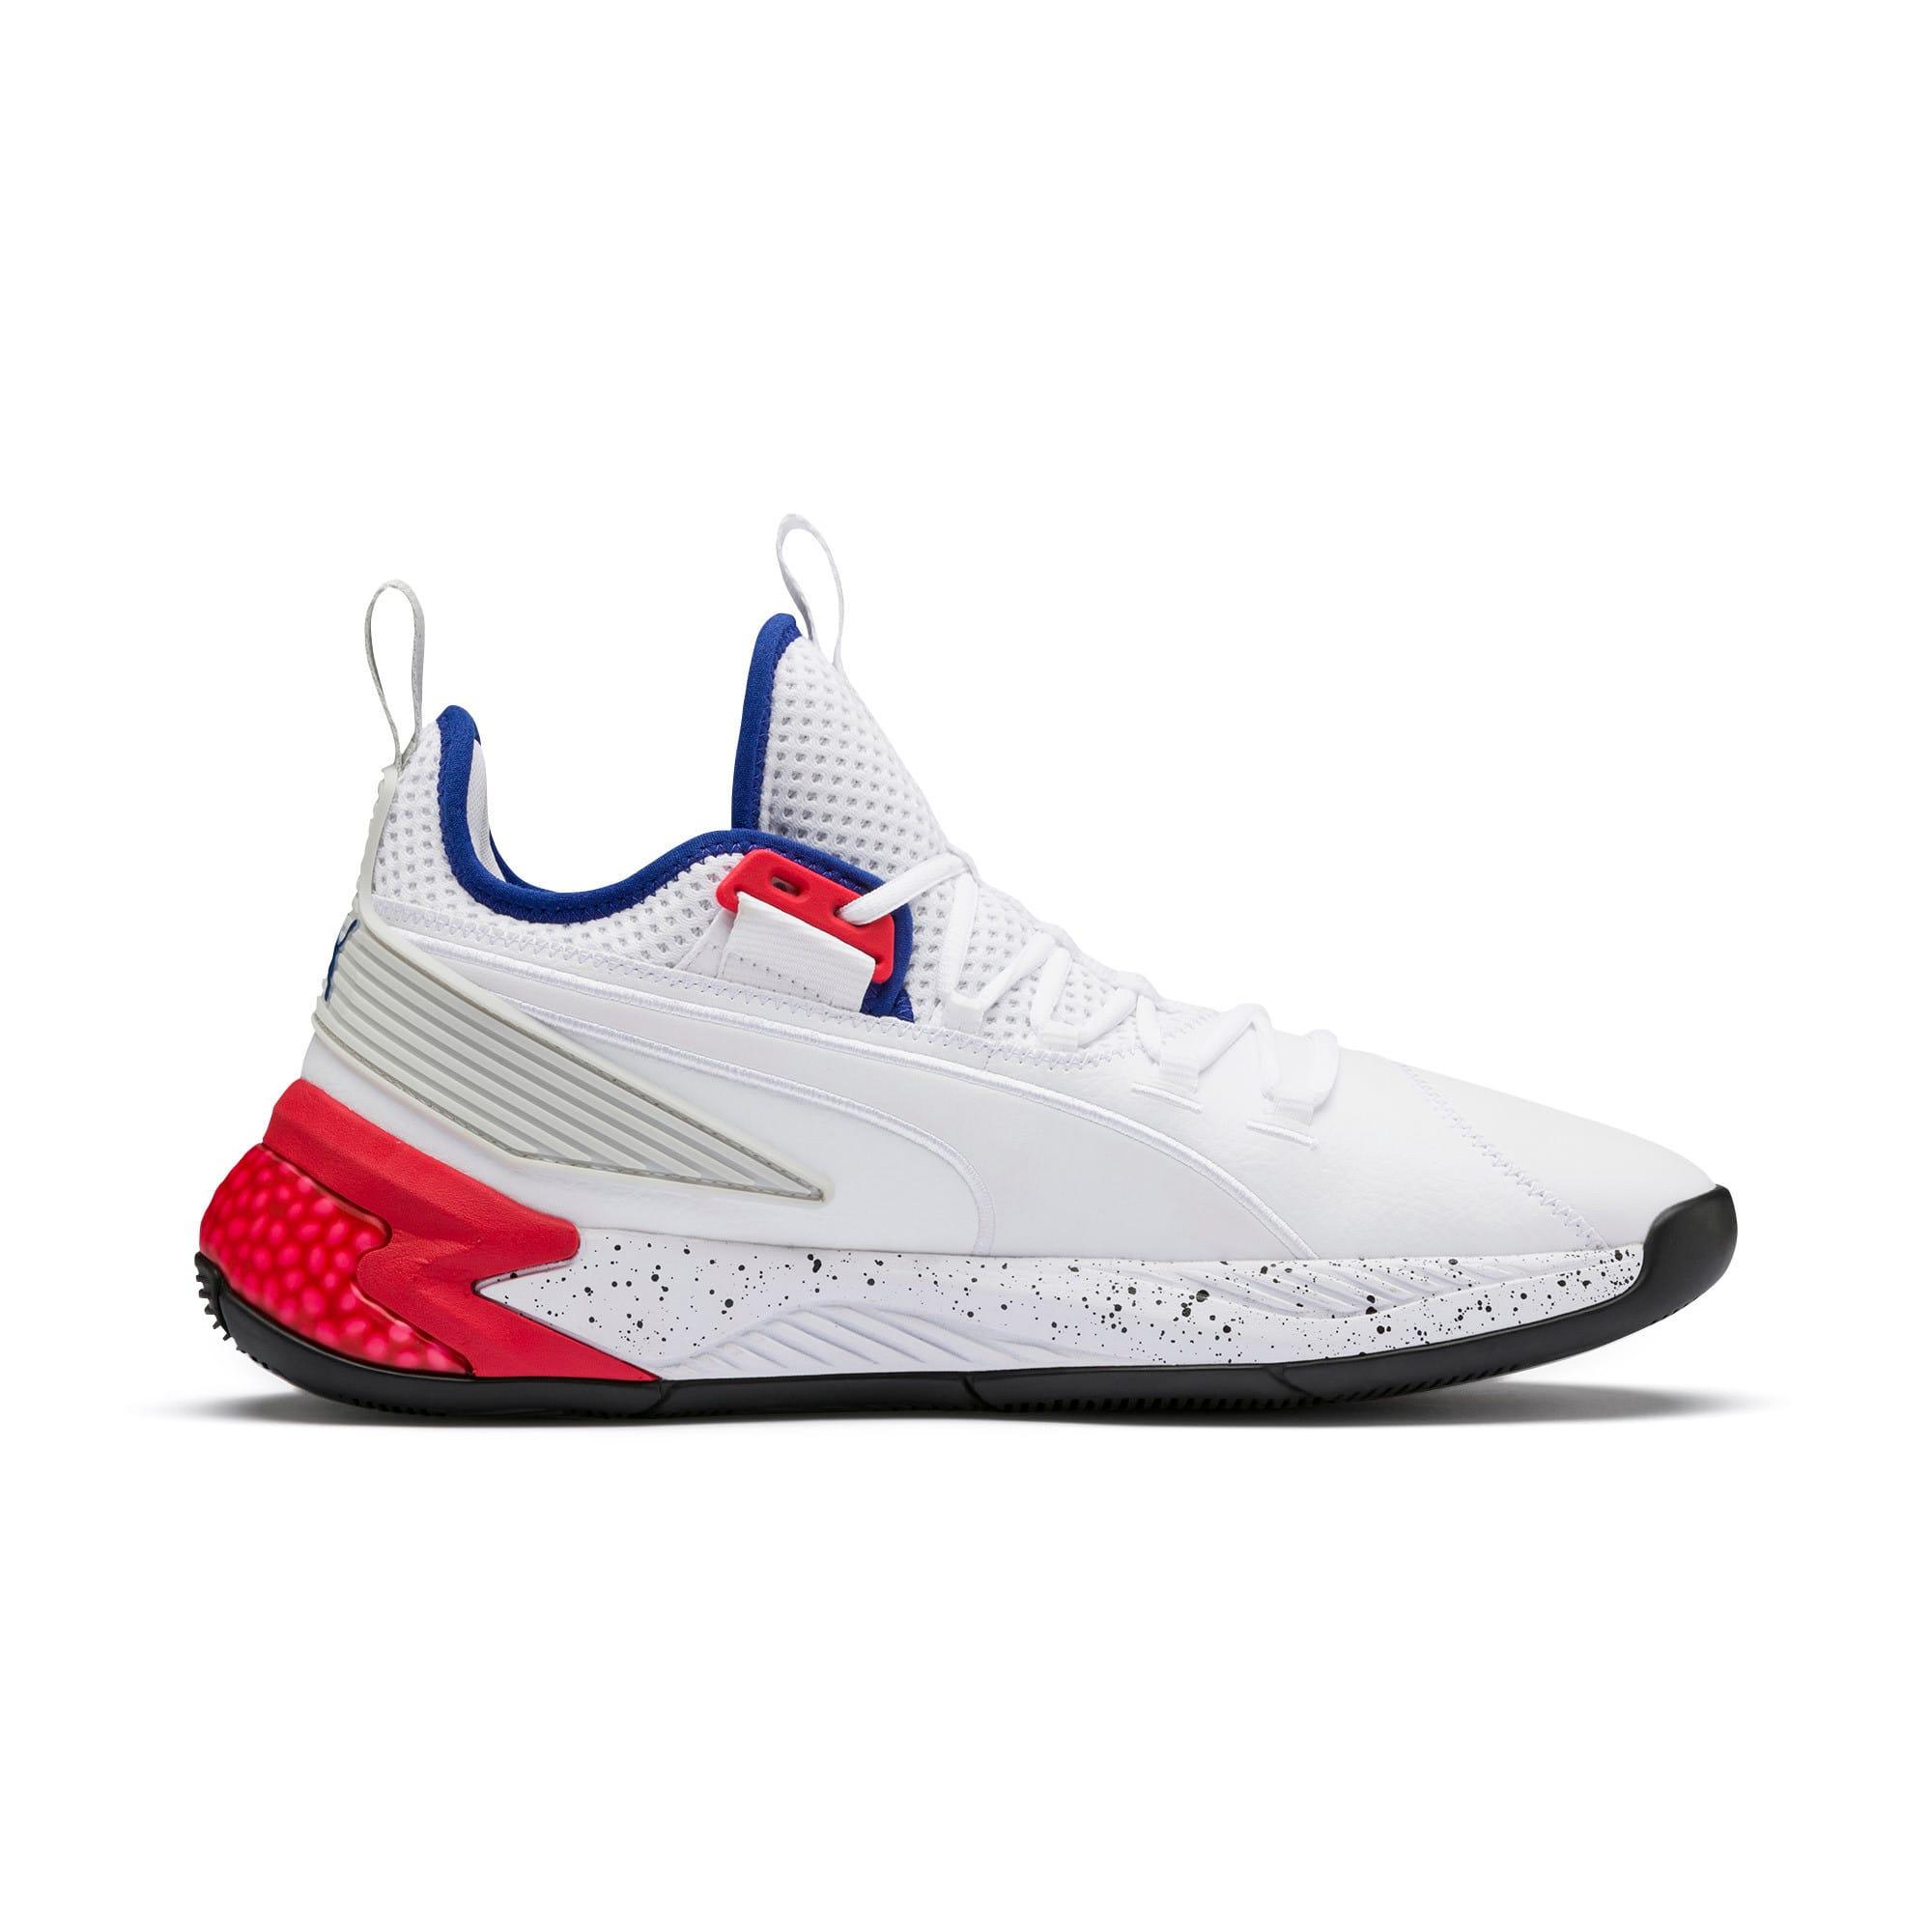 Thumbnail 5 of Chaussure de basketball Uproar Palace Guard pour homme, Puma White-Surf The Web, medium